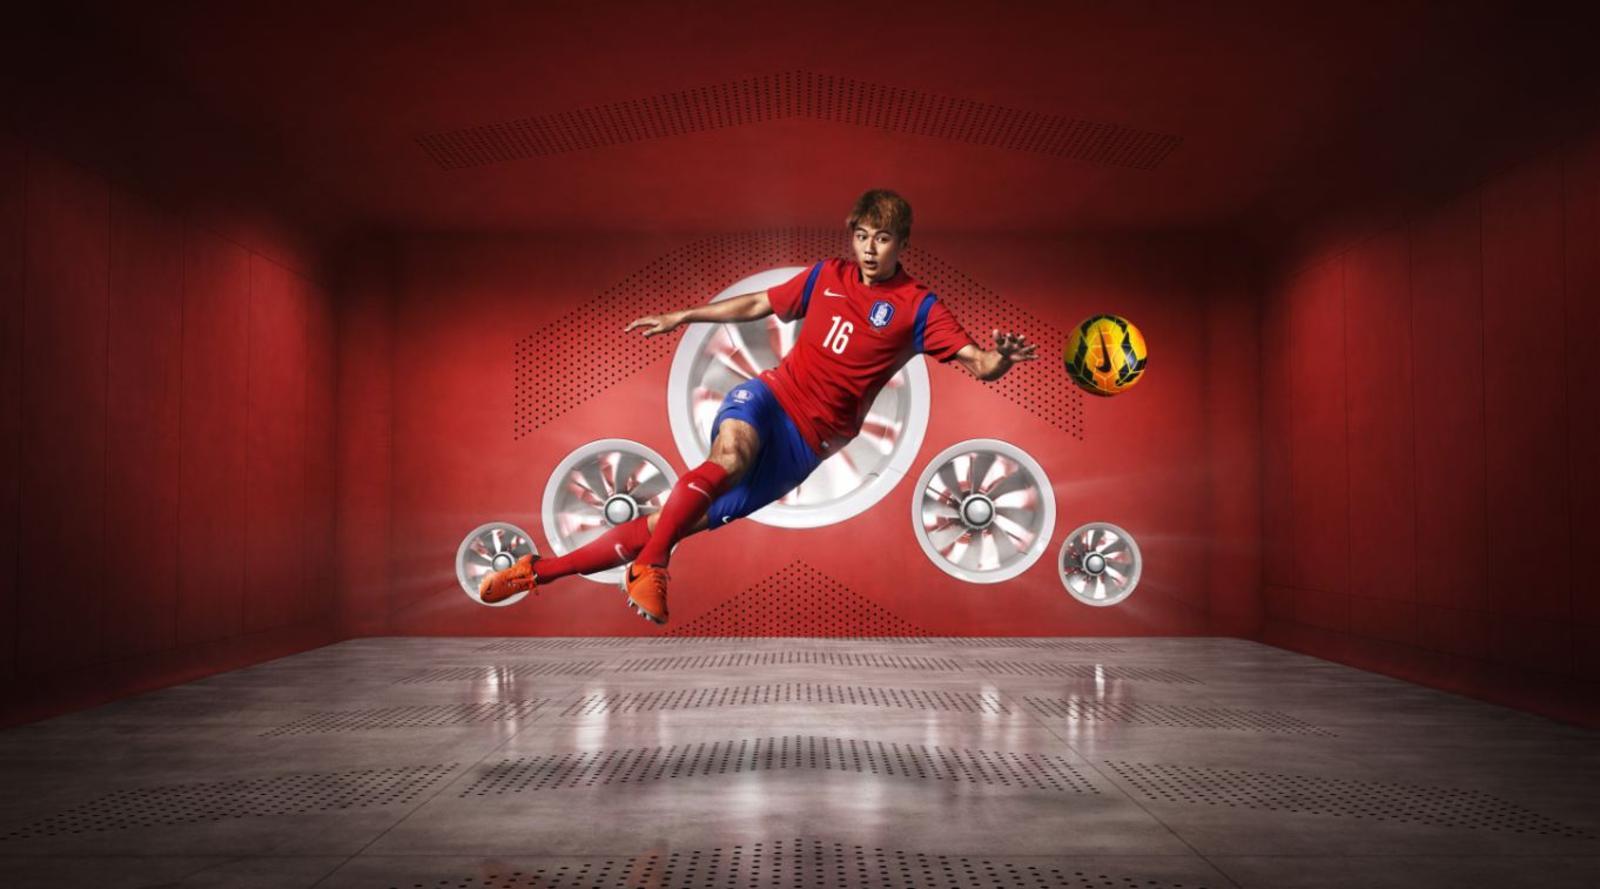 nike football unveils 2014 korea national team kit nike news